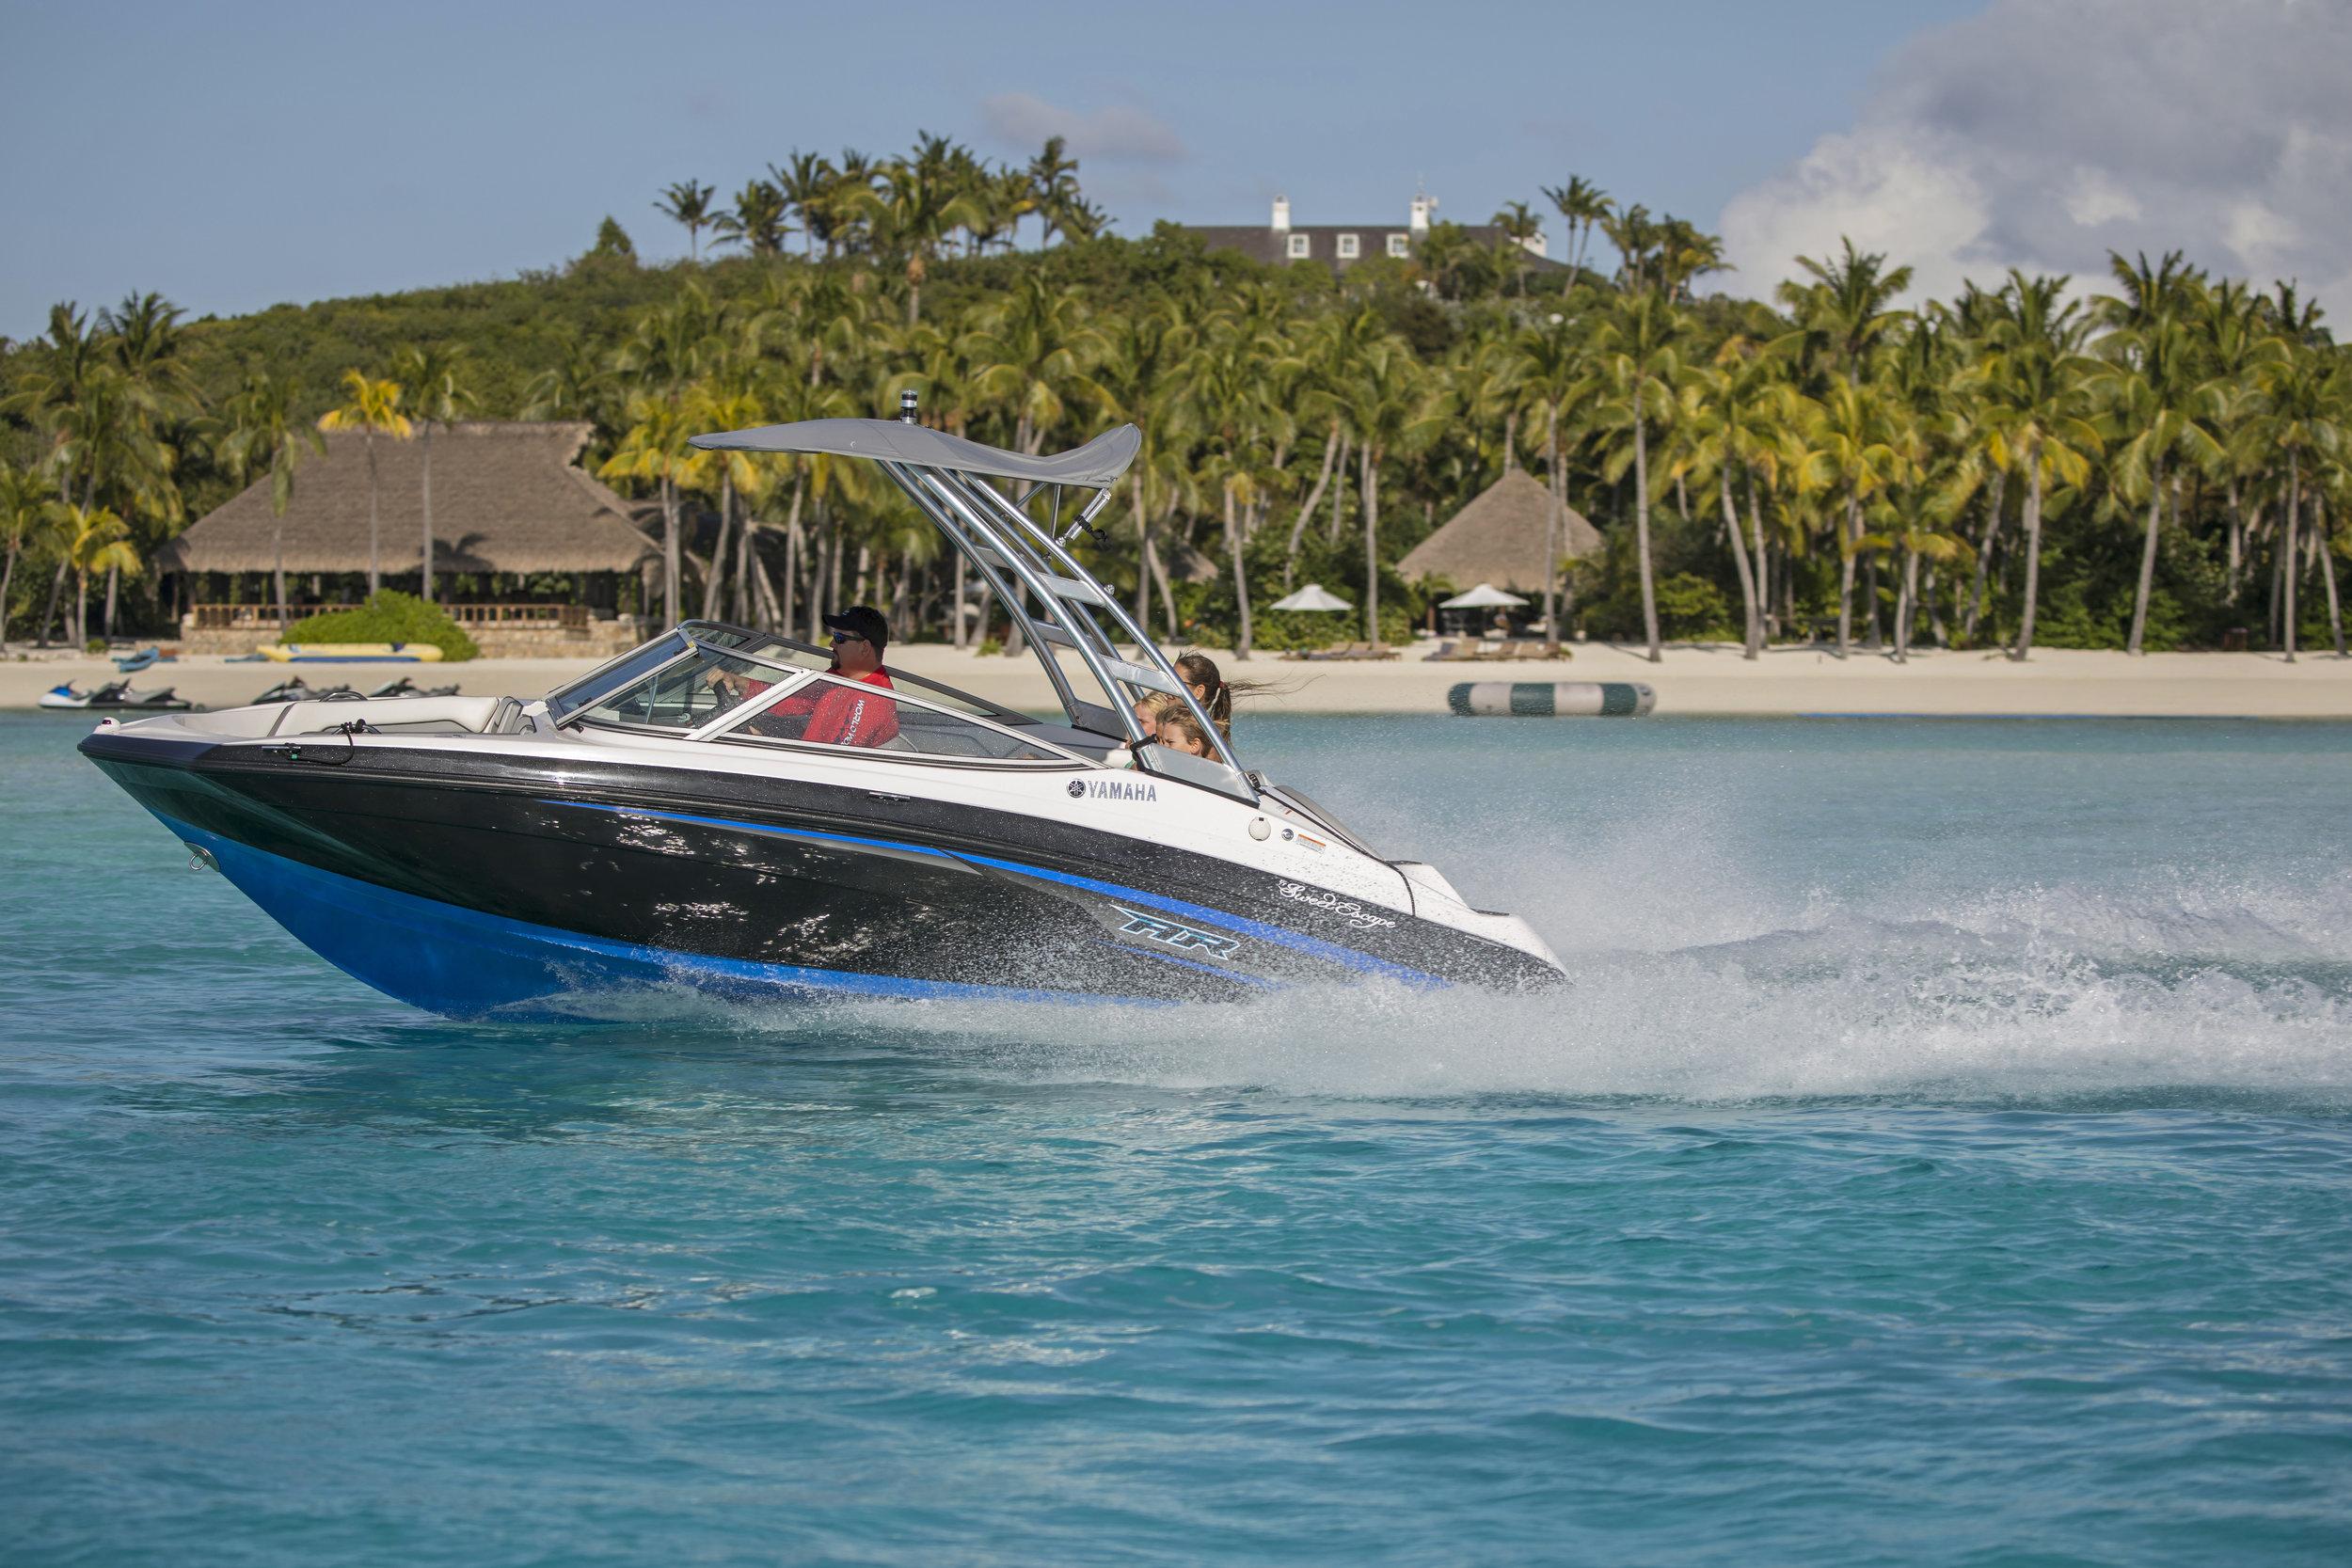 jason-decaires-taylor-Atlas-Yacht-sweet-escape-charter-dive-snorkle-activities-destinations-bahamas-luxury-eco-tourism-mdermaid-copperfield-rudder-cut-cay-yamaha-AR190-jet-boat